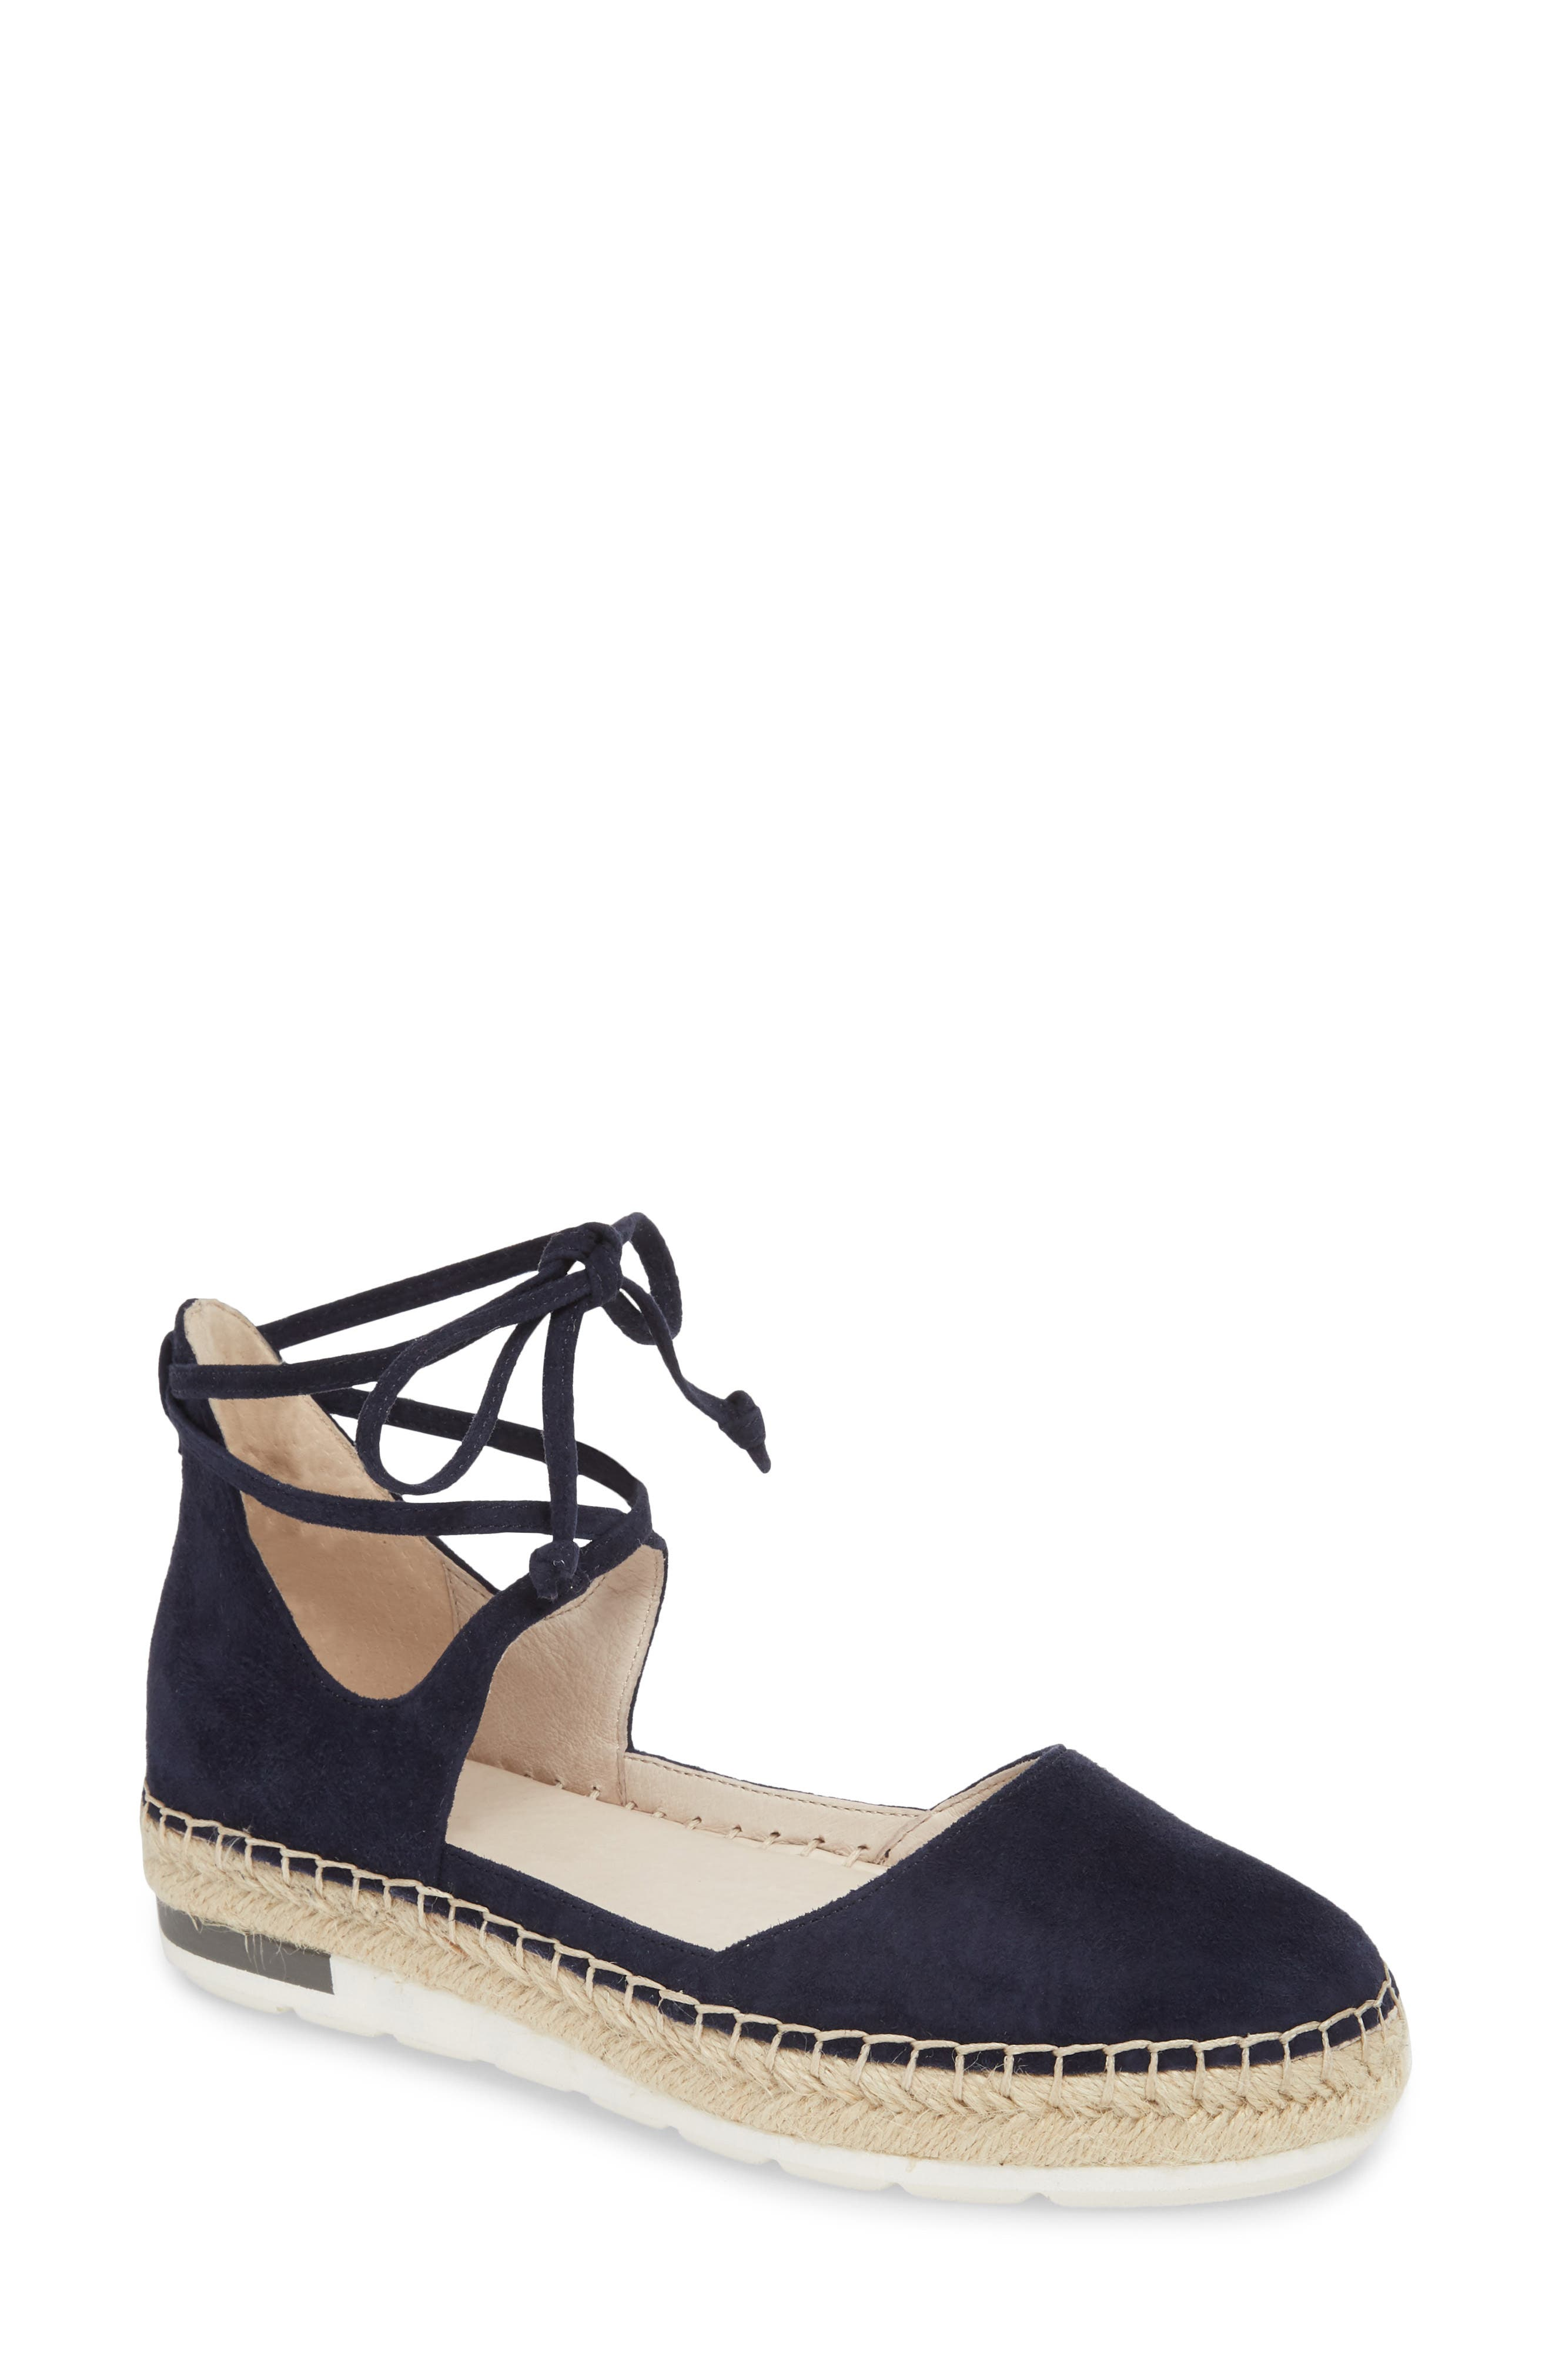 Leena Ankle Strap Sandal,                             Main thumbnail 1, color,                             Navy Suede